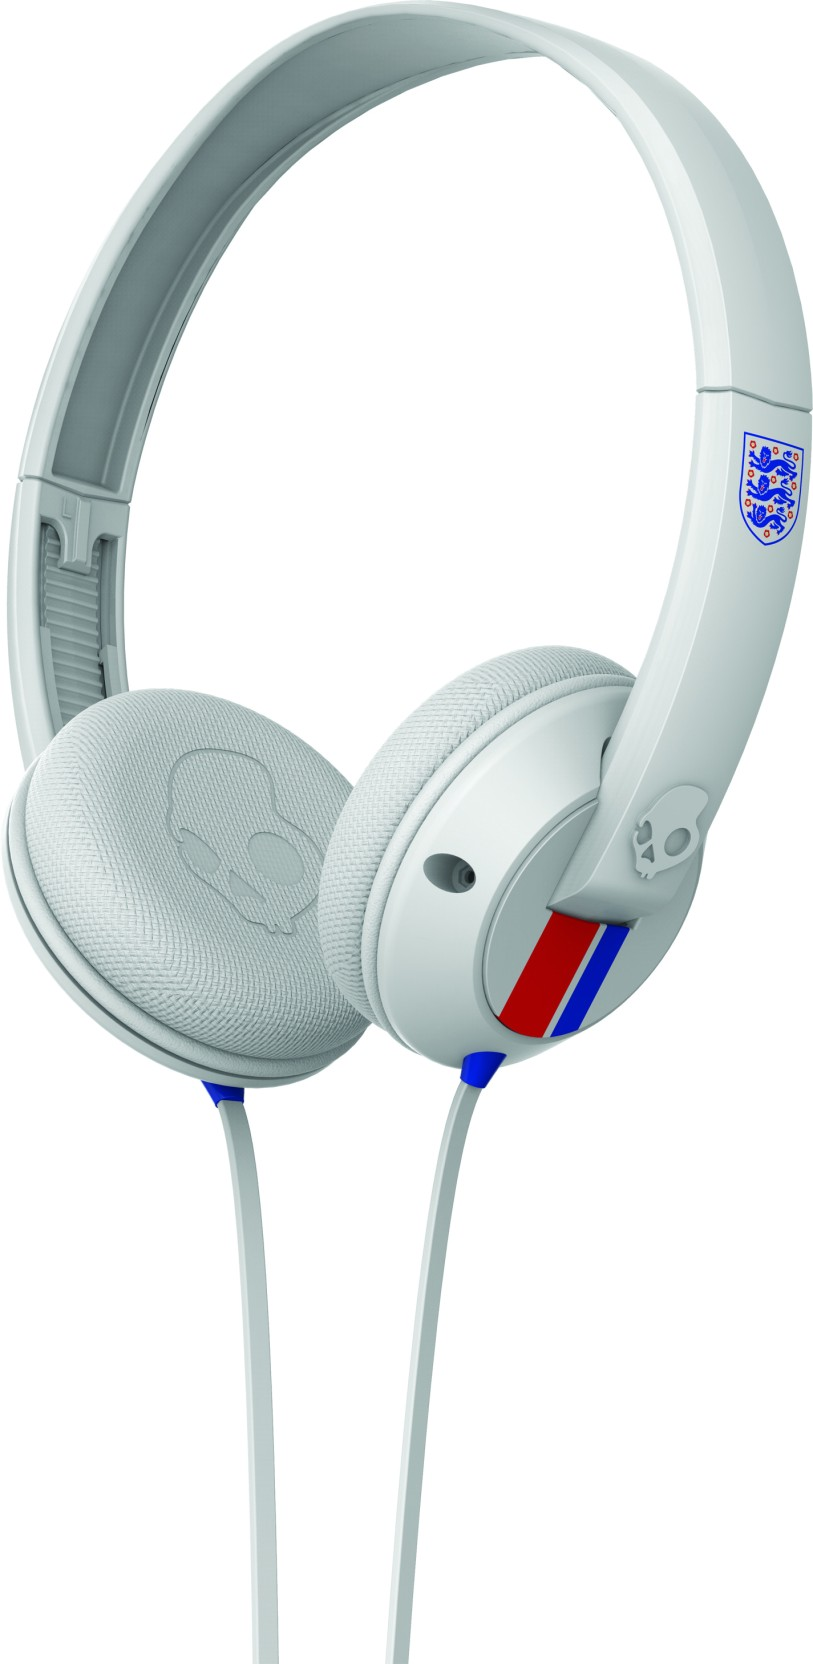 Skullcandy SGURGY-160 Uprock England On-the-ear Headset with Mic ...